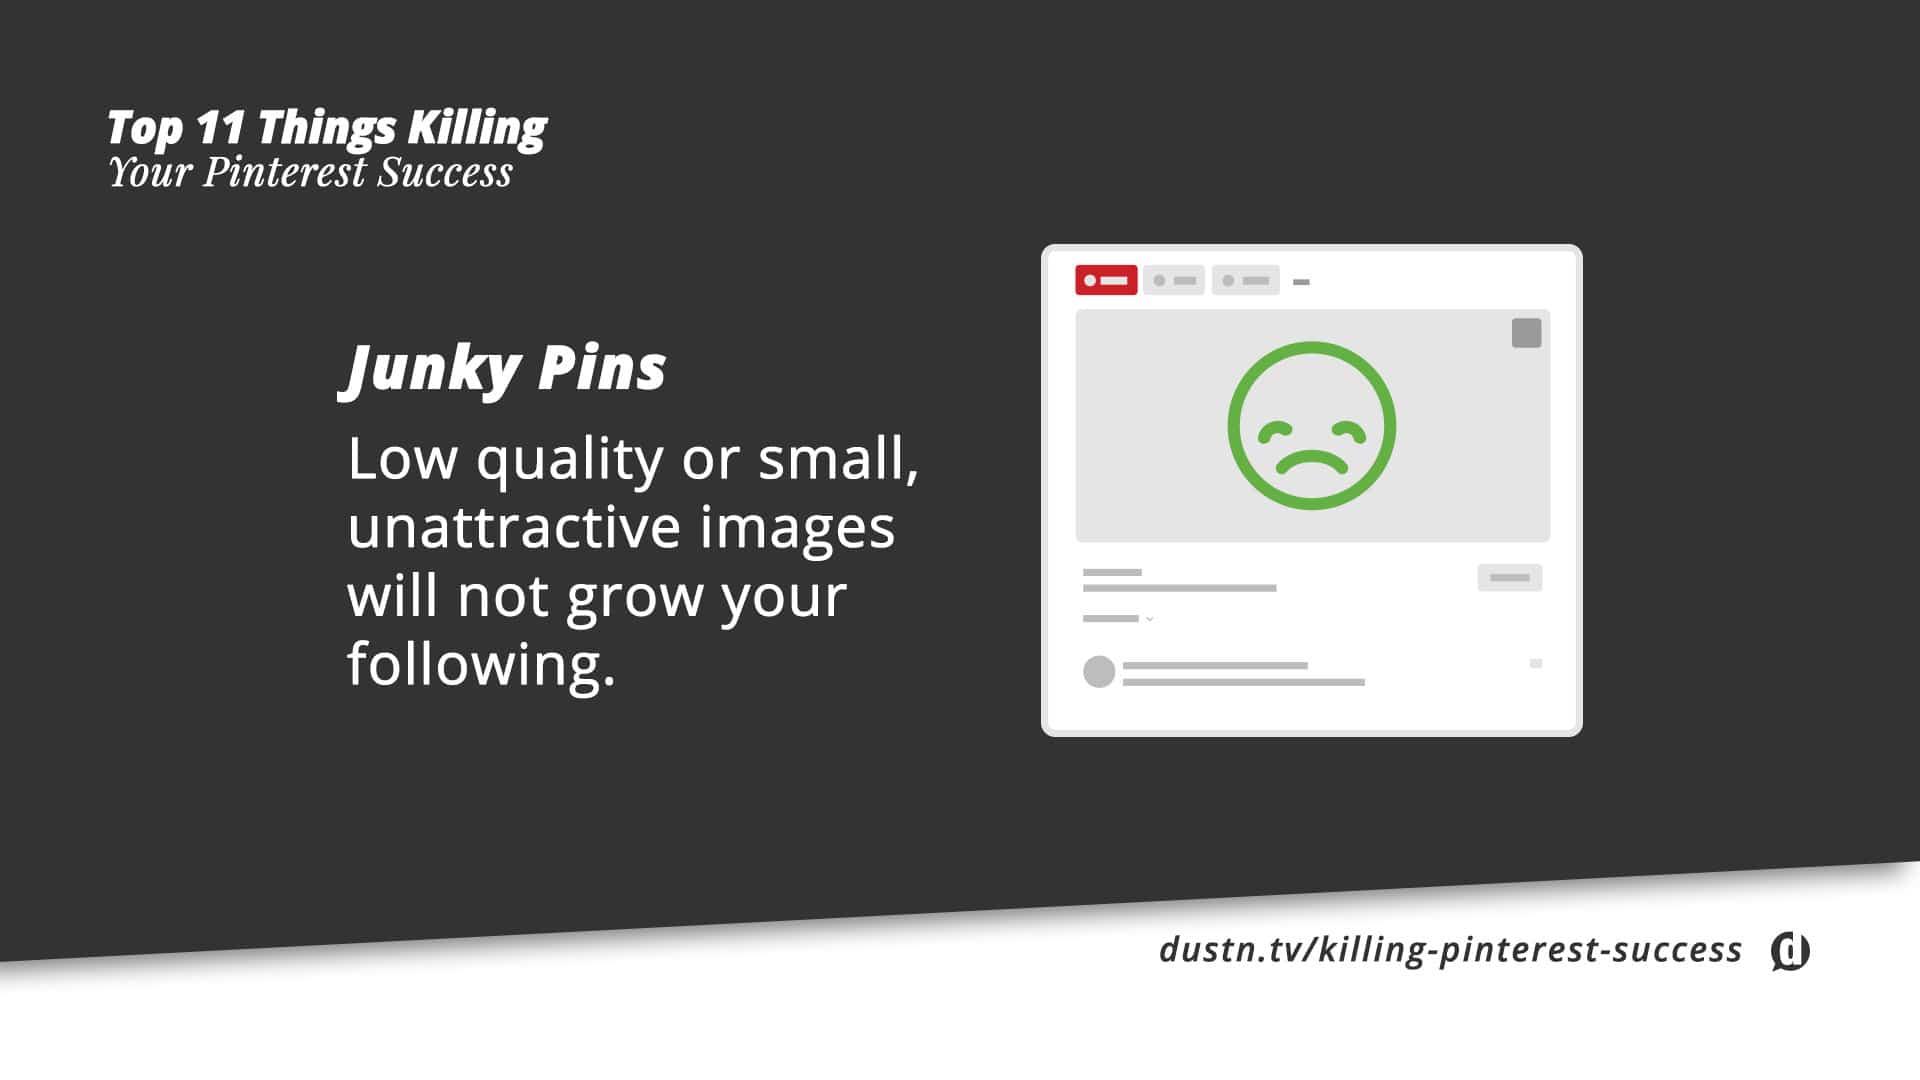 don't pin junky pins